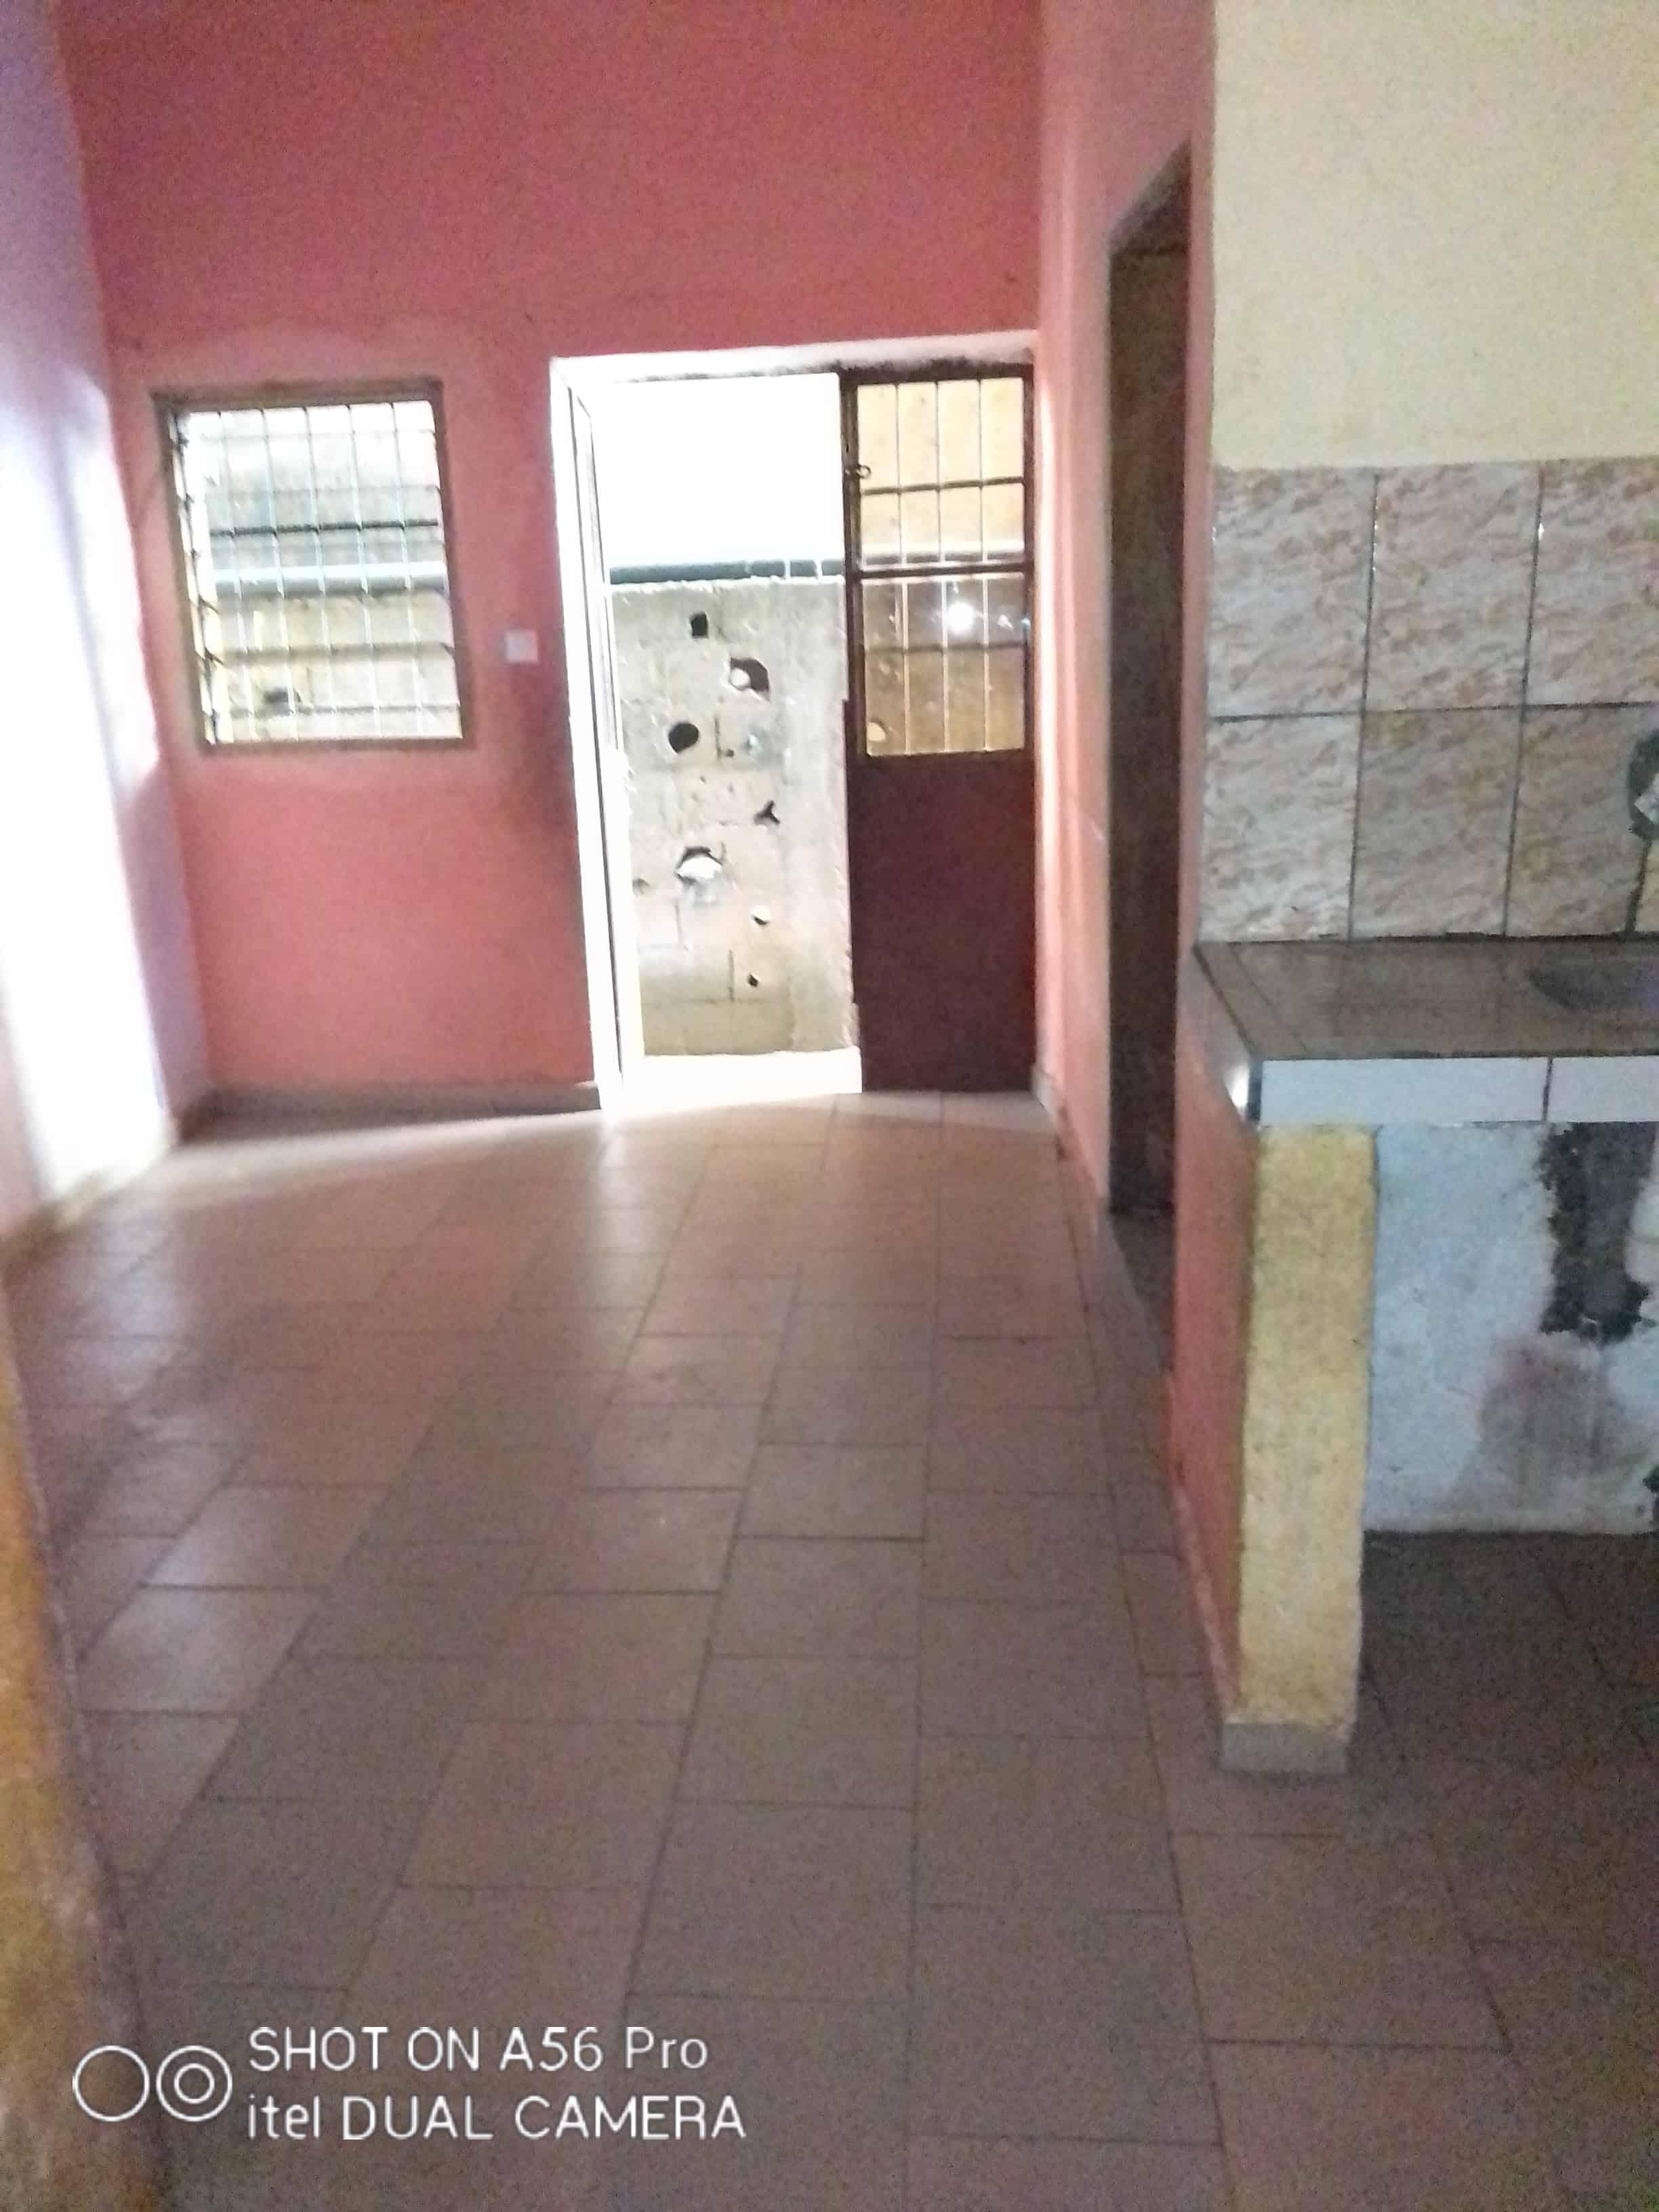 Apartment to rent - Douala, Logpom, Montana city - 1 living room(s), 1 bedroom(s), 1 bathroom(s) - 40 000 FCFA / month